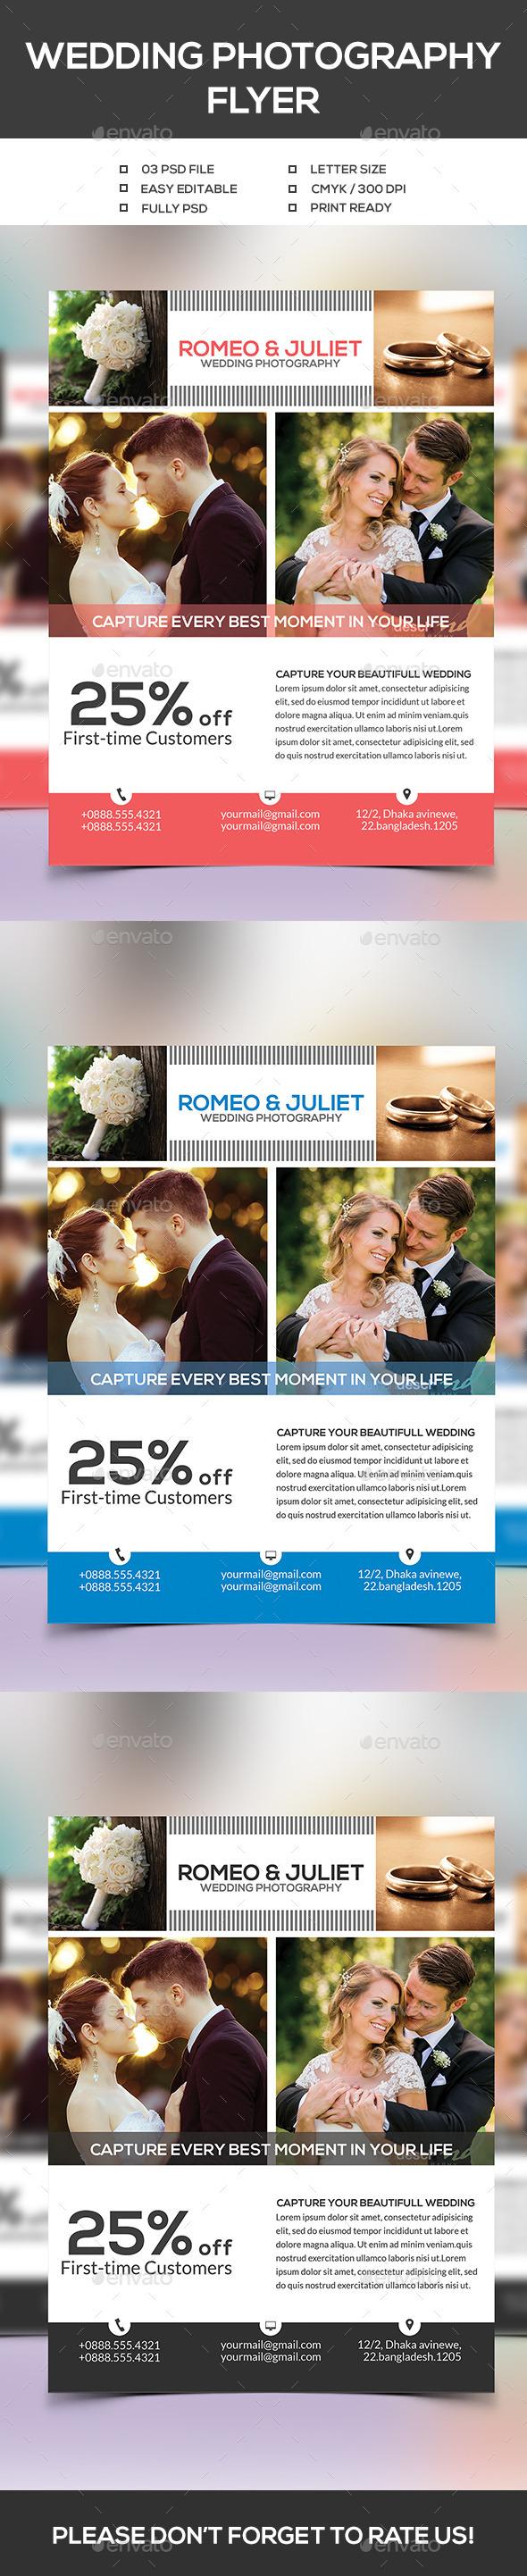 Wedding Photography Flyer - Events Flyers